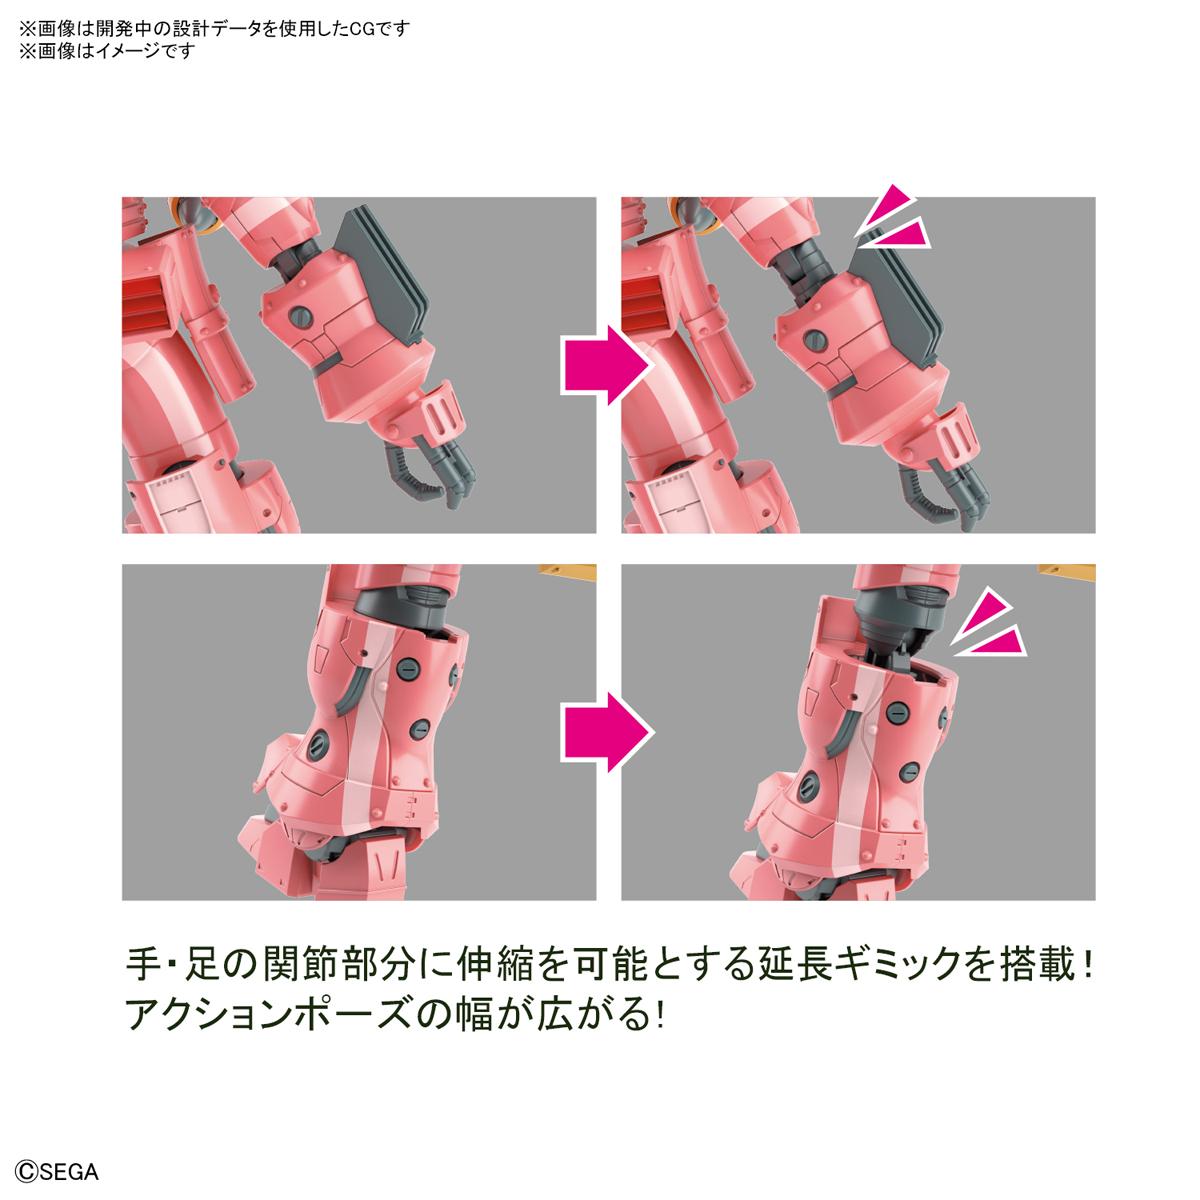 HG 1/24『霊子戦闘機・試製桜武(天宮さくら機)』新サクラ大戦 プラモデル-004